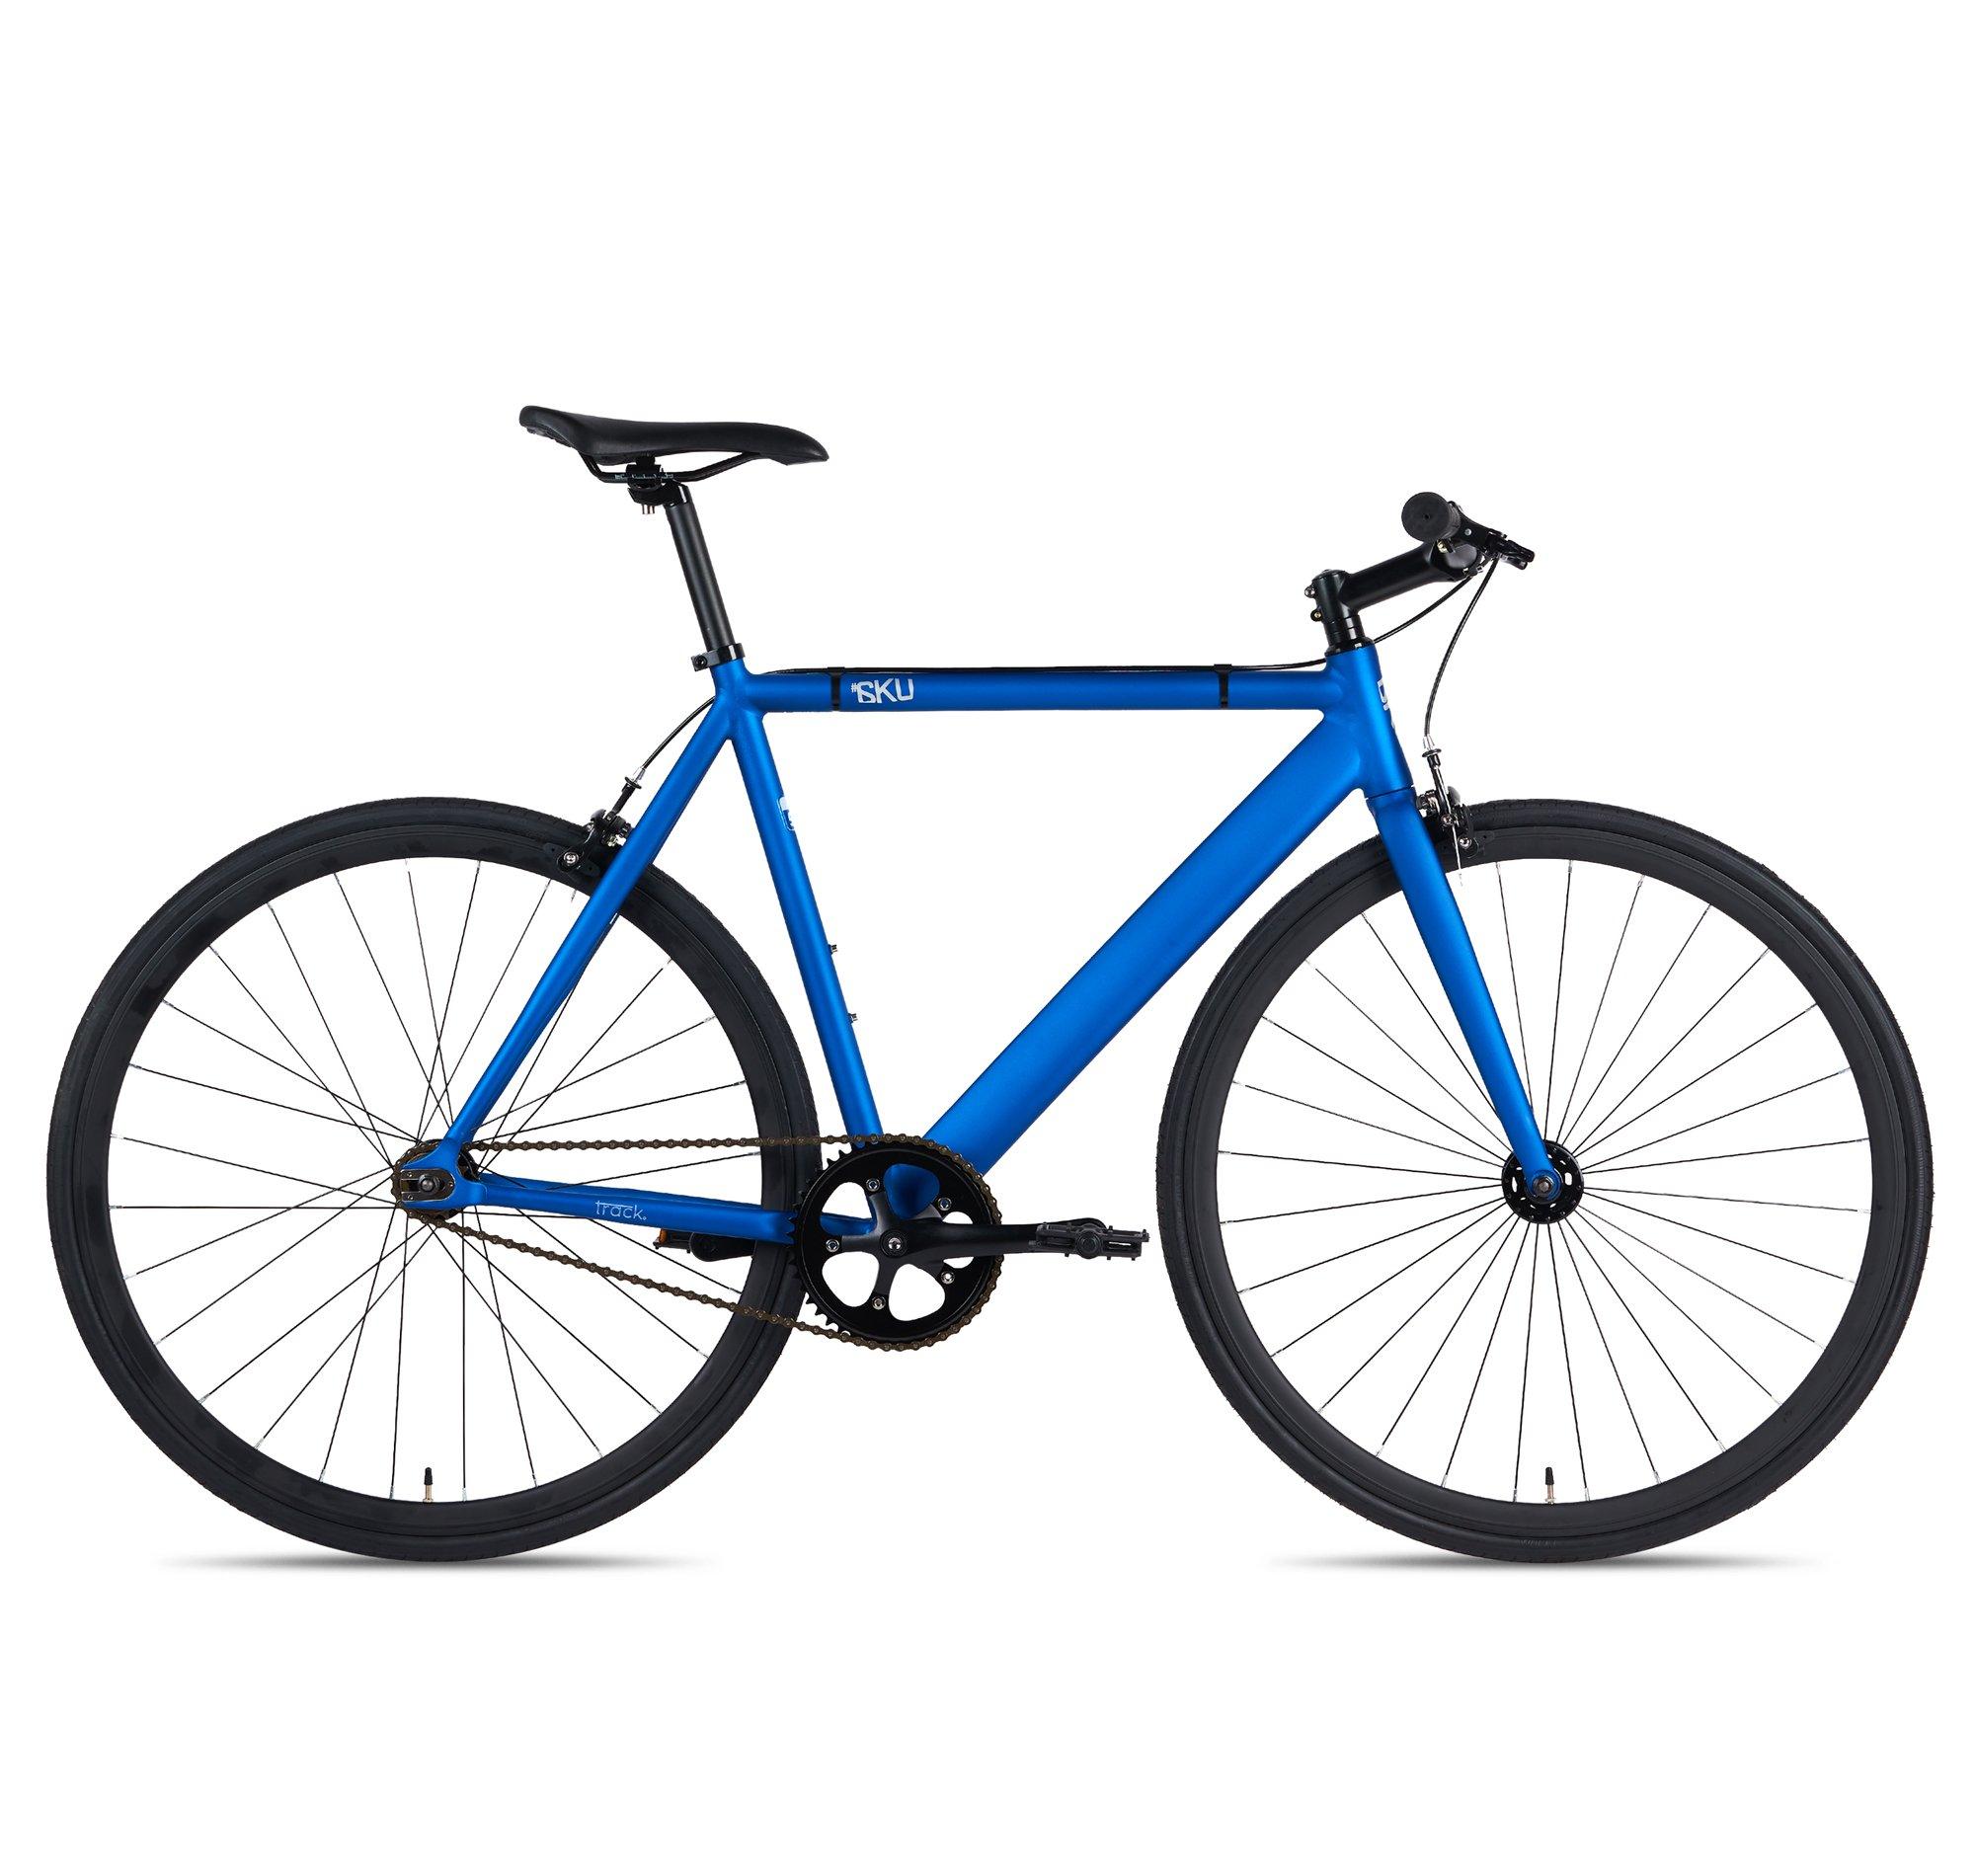 3c9303554bc Get Quotations · 6KU Aluminum Fixed Gear Single-Speed Fixie Urban Track Bike